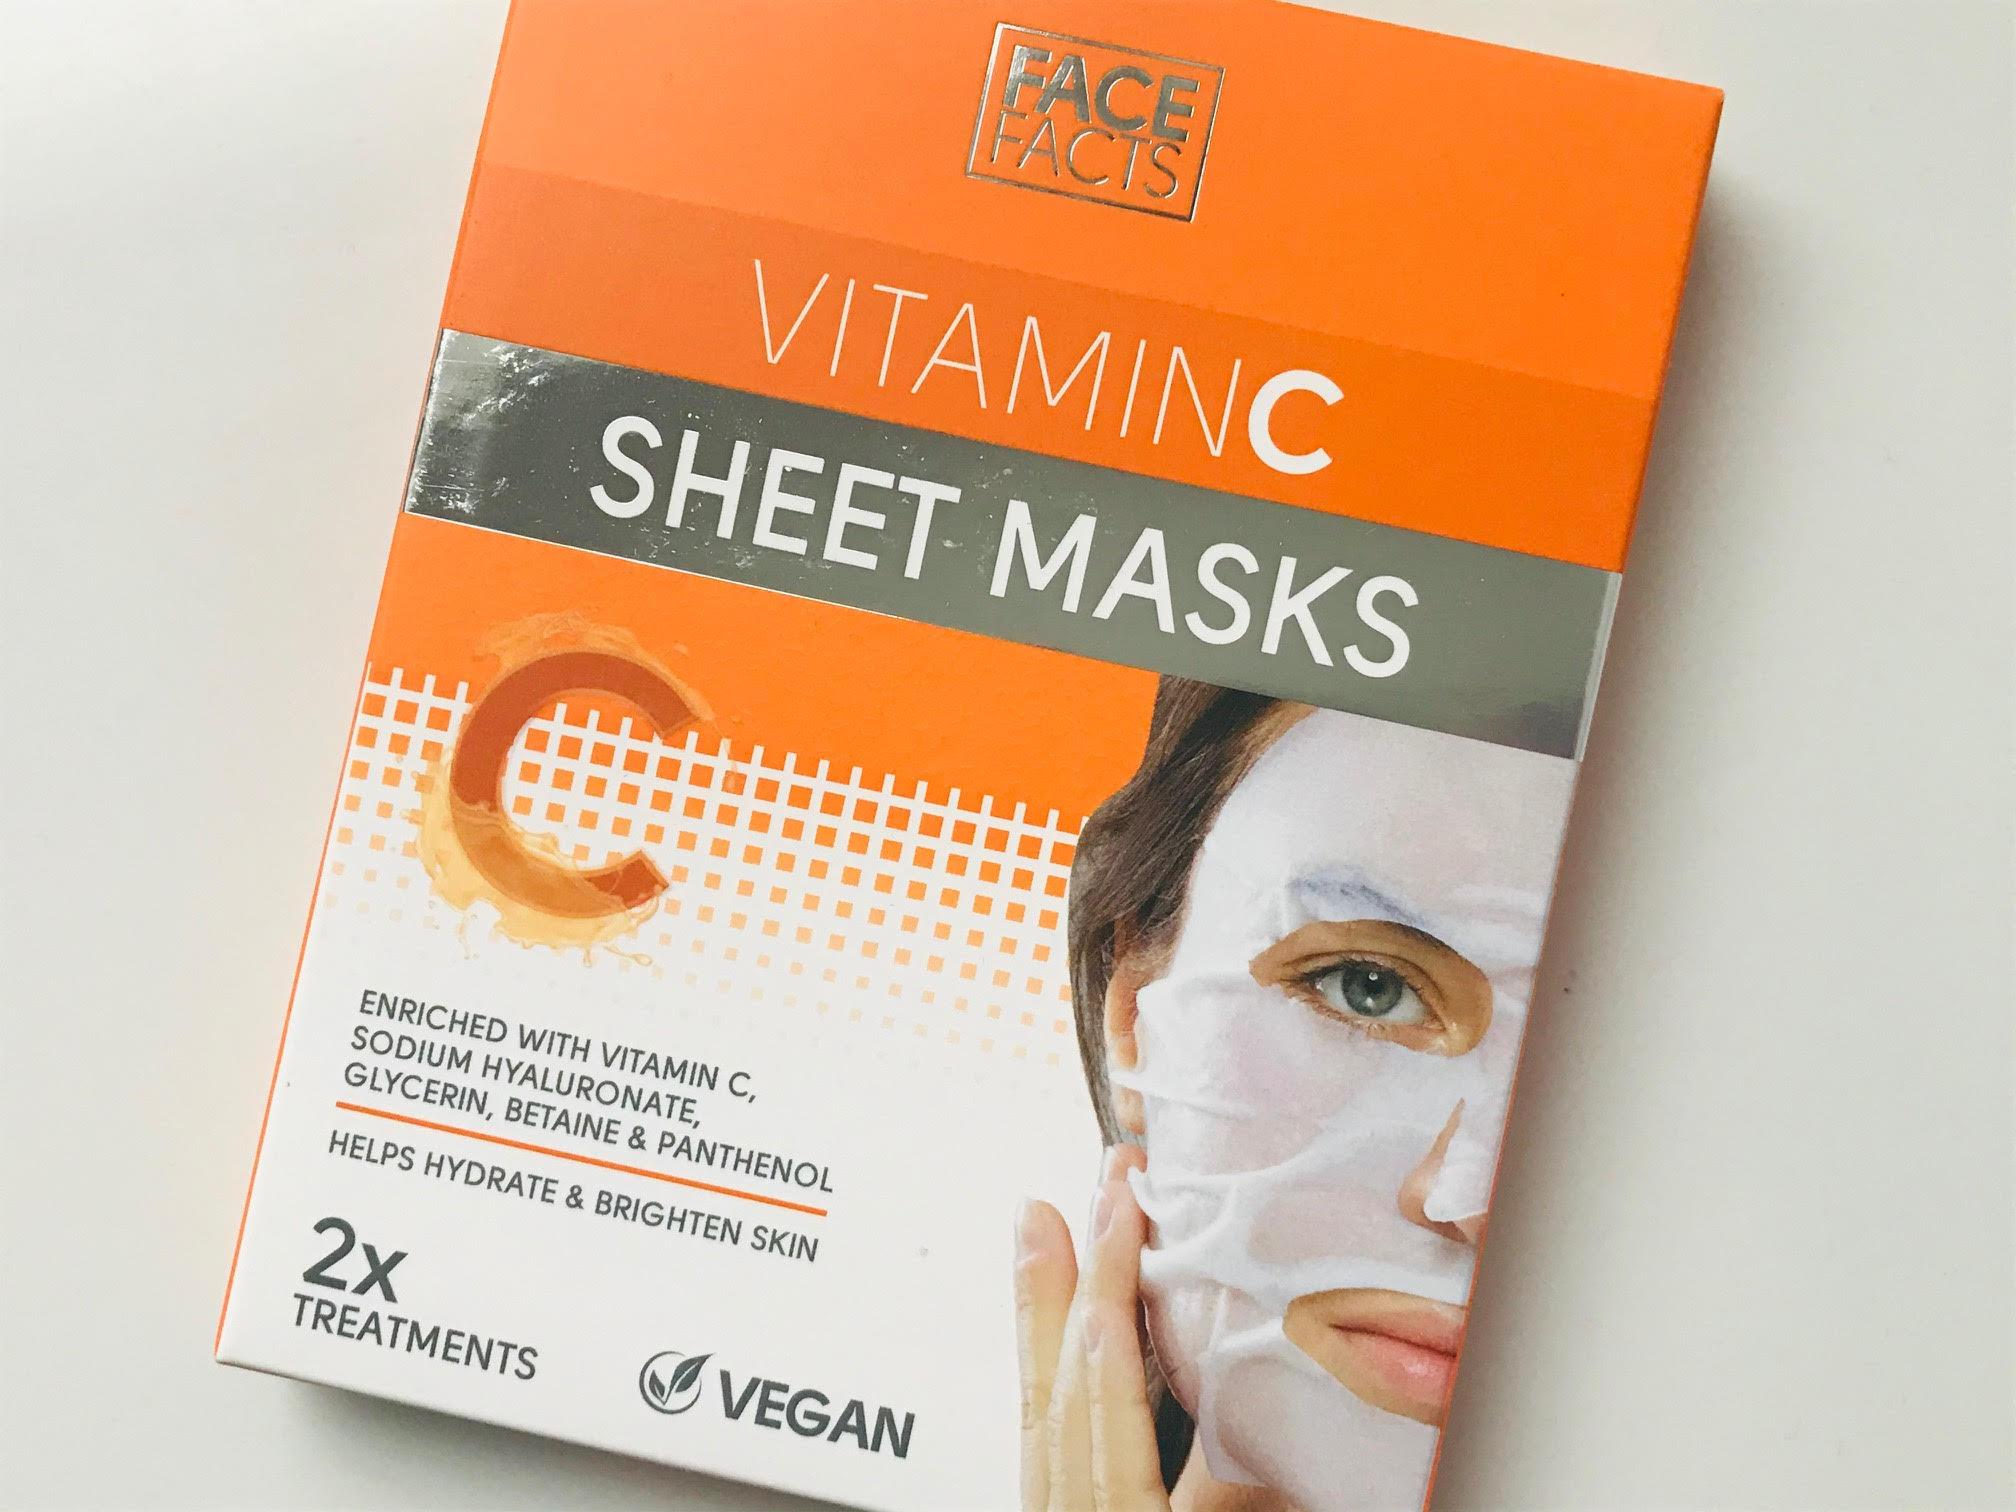 face facts vitamin c sheet mask